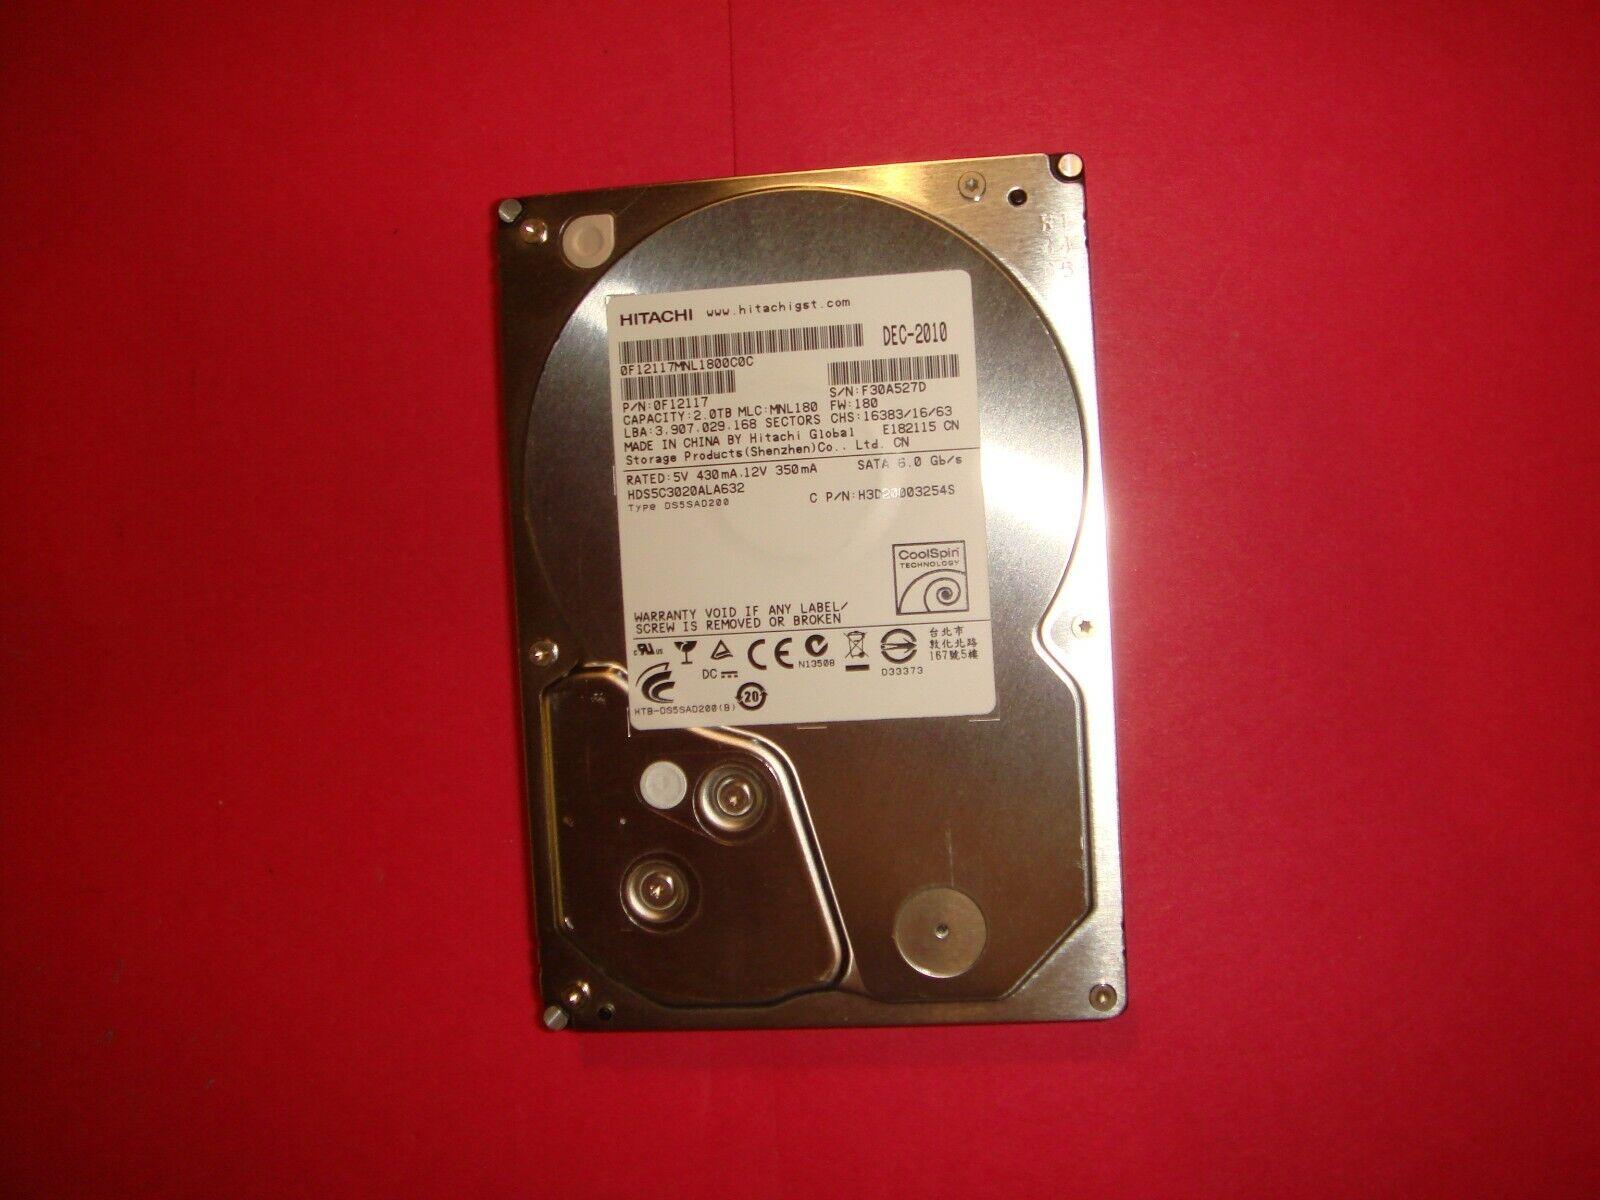 0F12116 Hitachi 1.5Tb 3.5Inch Hard Drive